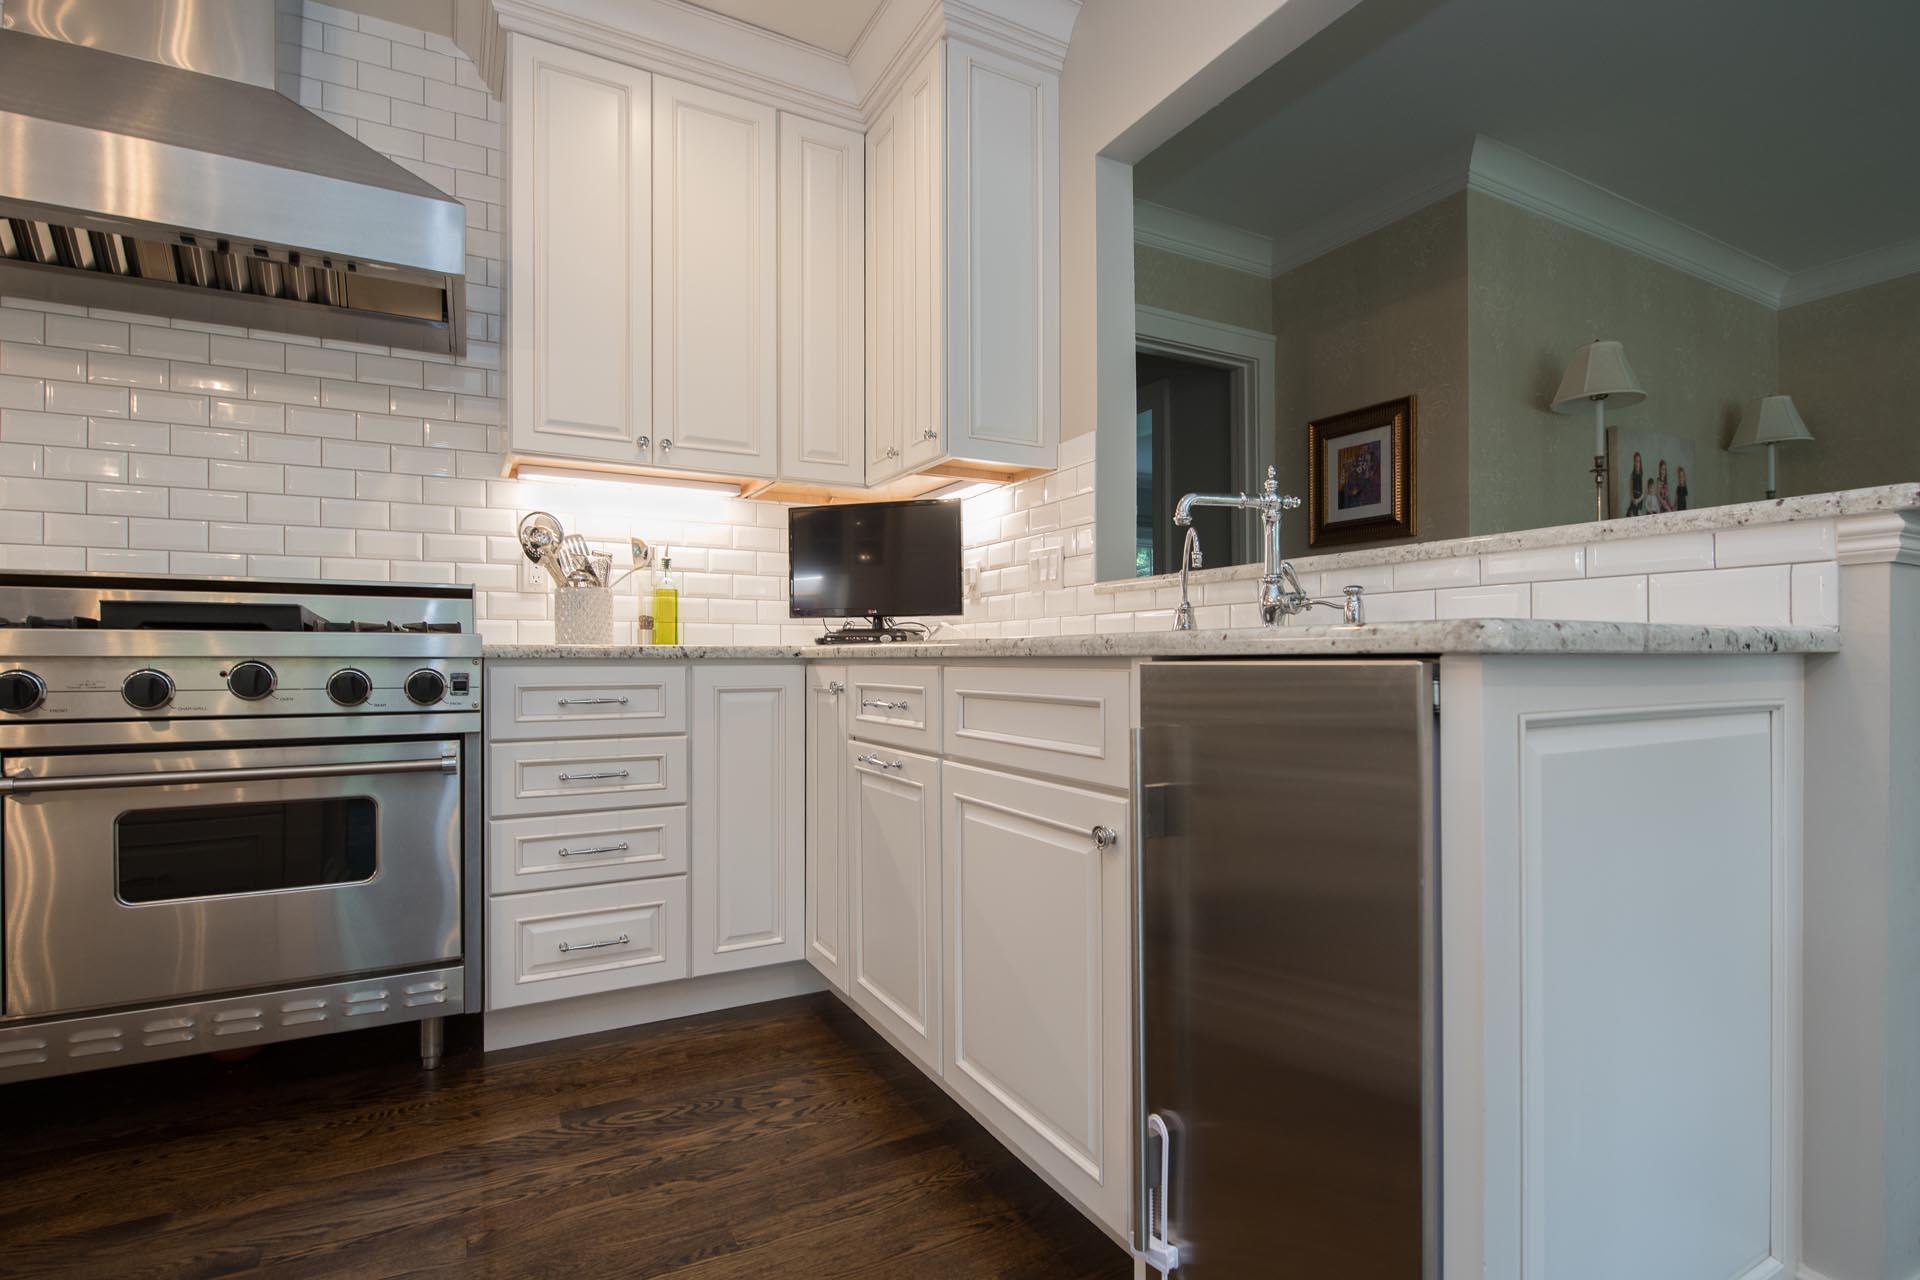 Faucet and Sink | Kitchen Renovation | Saginaw, MI